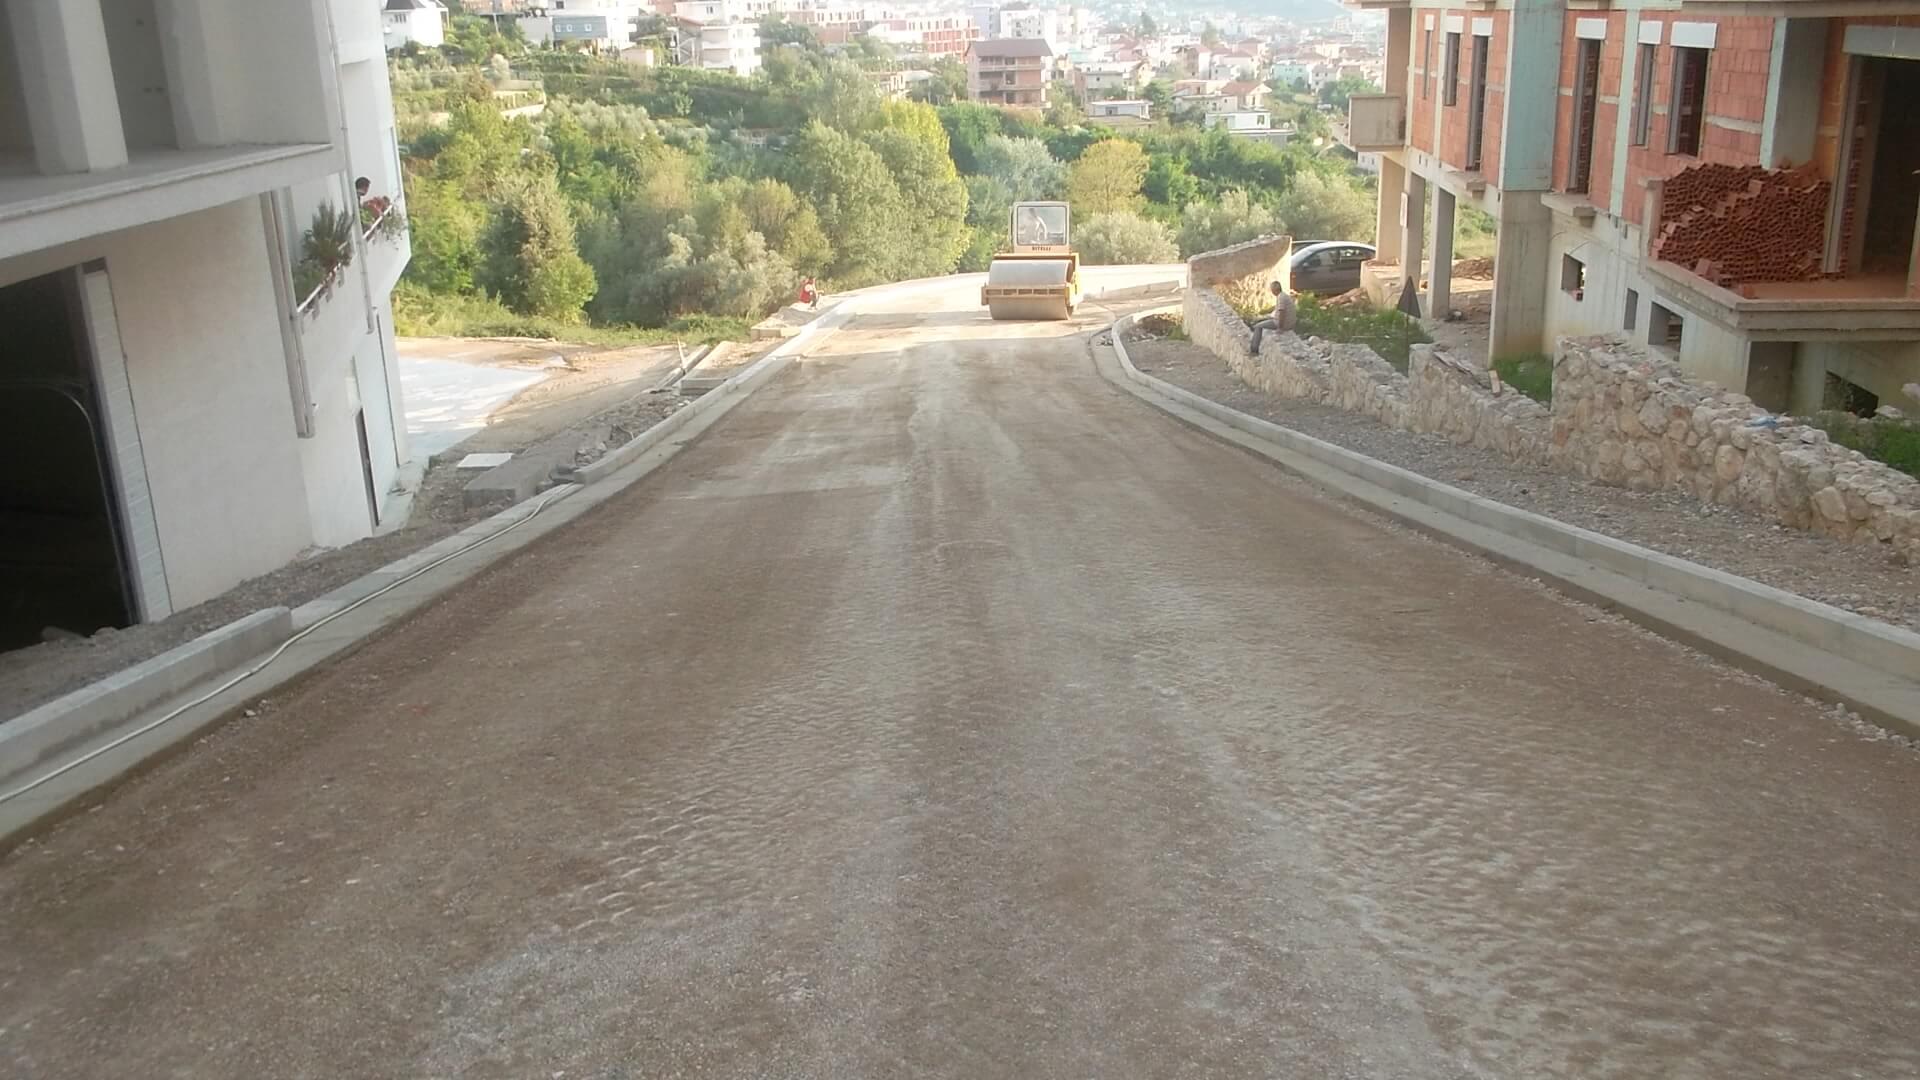 Rikonstruksion i rruges Qesarake,Dajt,FSHZH